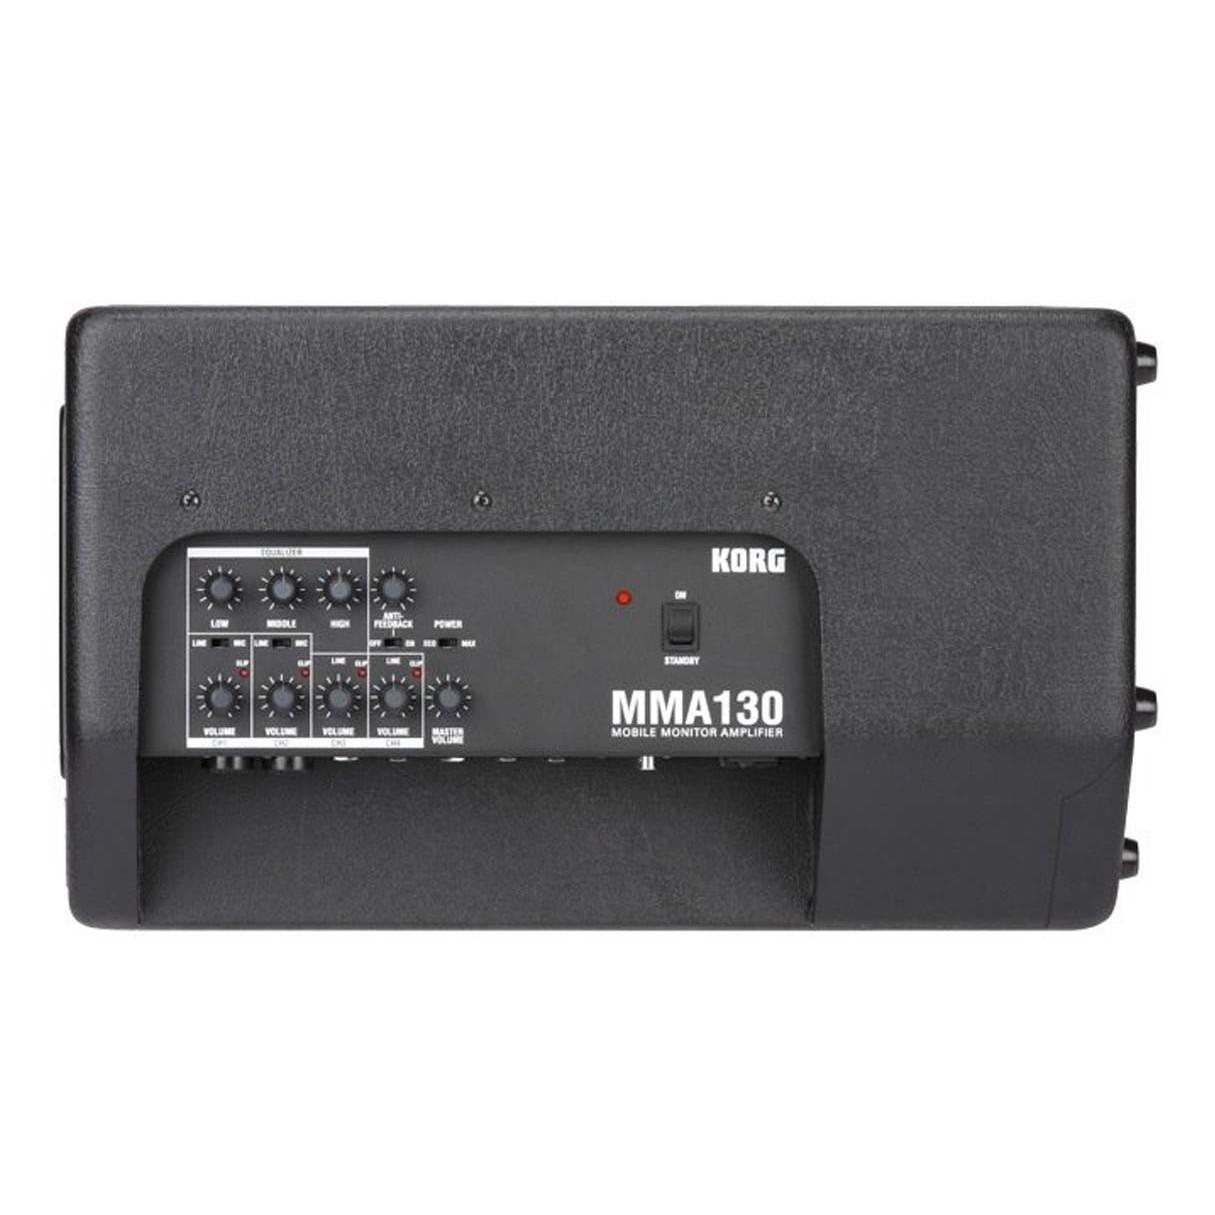 Korg Keyboard Amplifiers : korg mma130 buy keyboard amplifier best price ~ Vivirlamusica.com Haus und Dekorationen